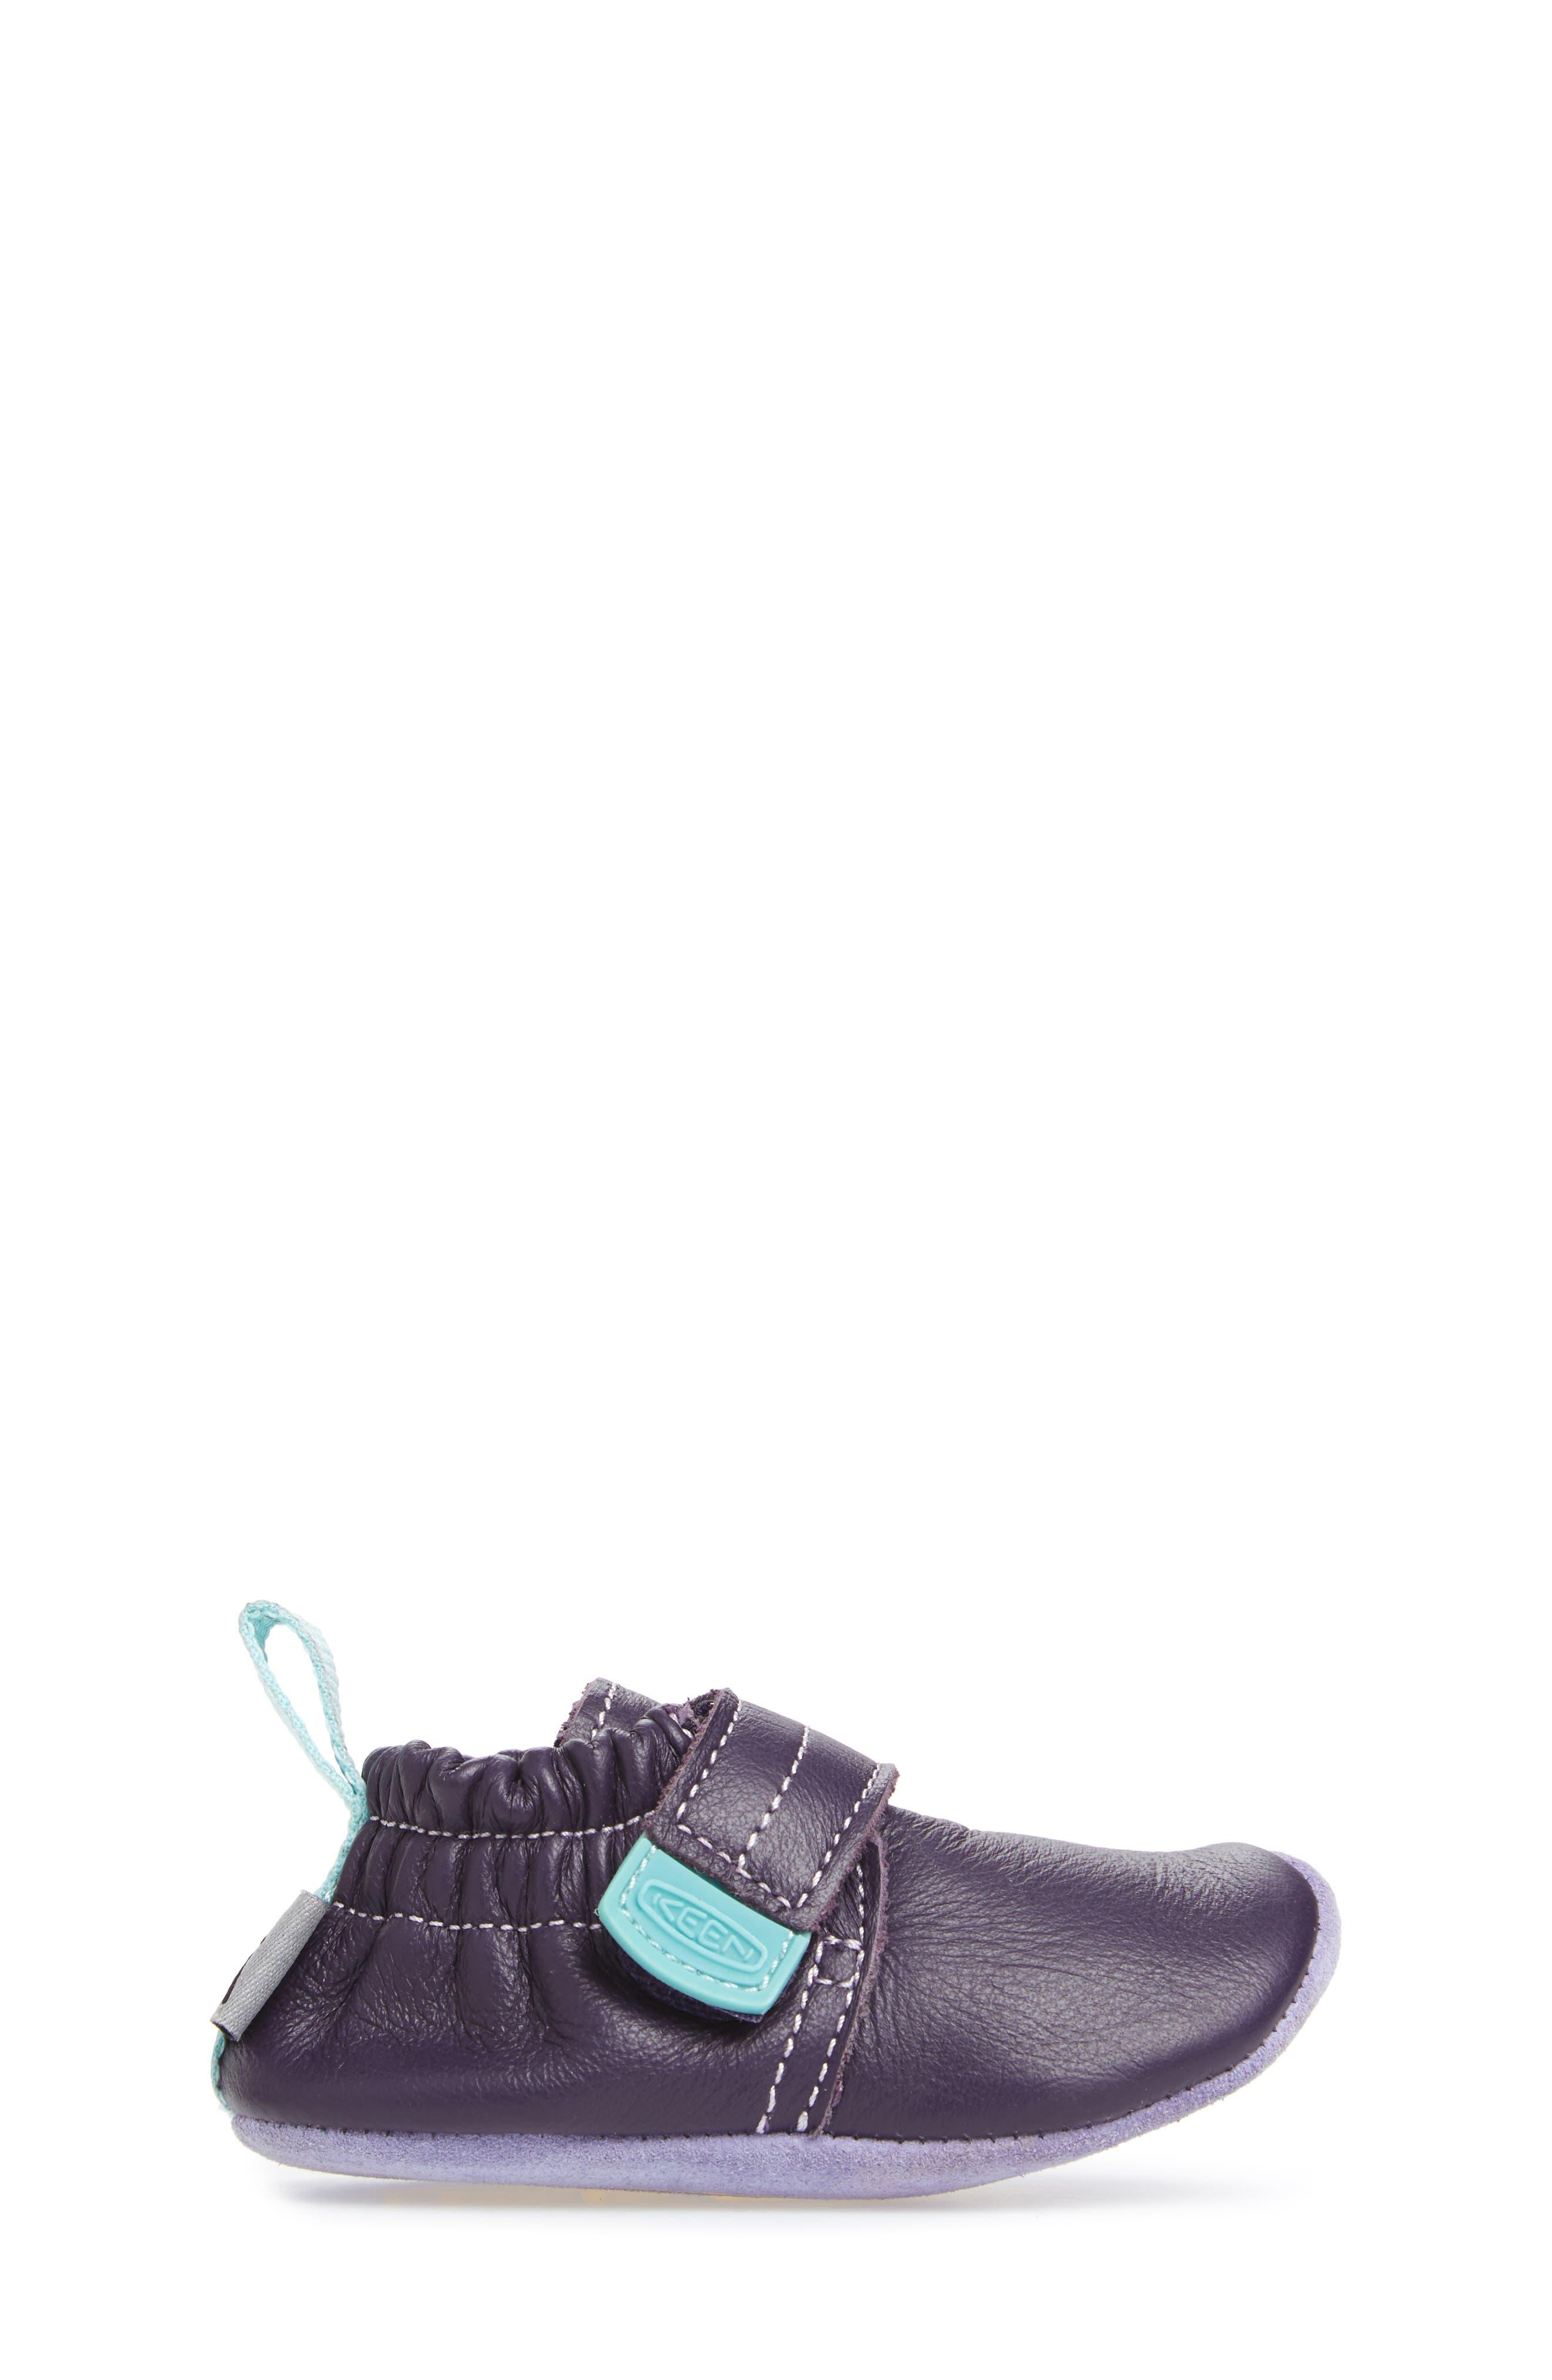 Leo Crib Shoe,                             Alternate thumbnail 3, color,                             PURPLE / SWEET LAVENDER